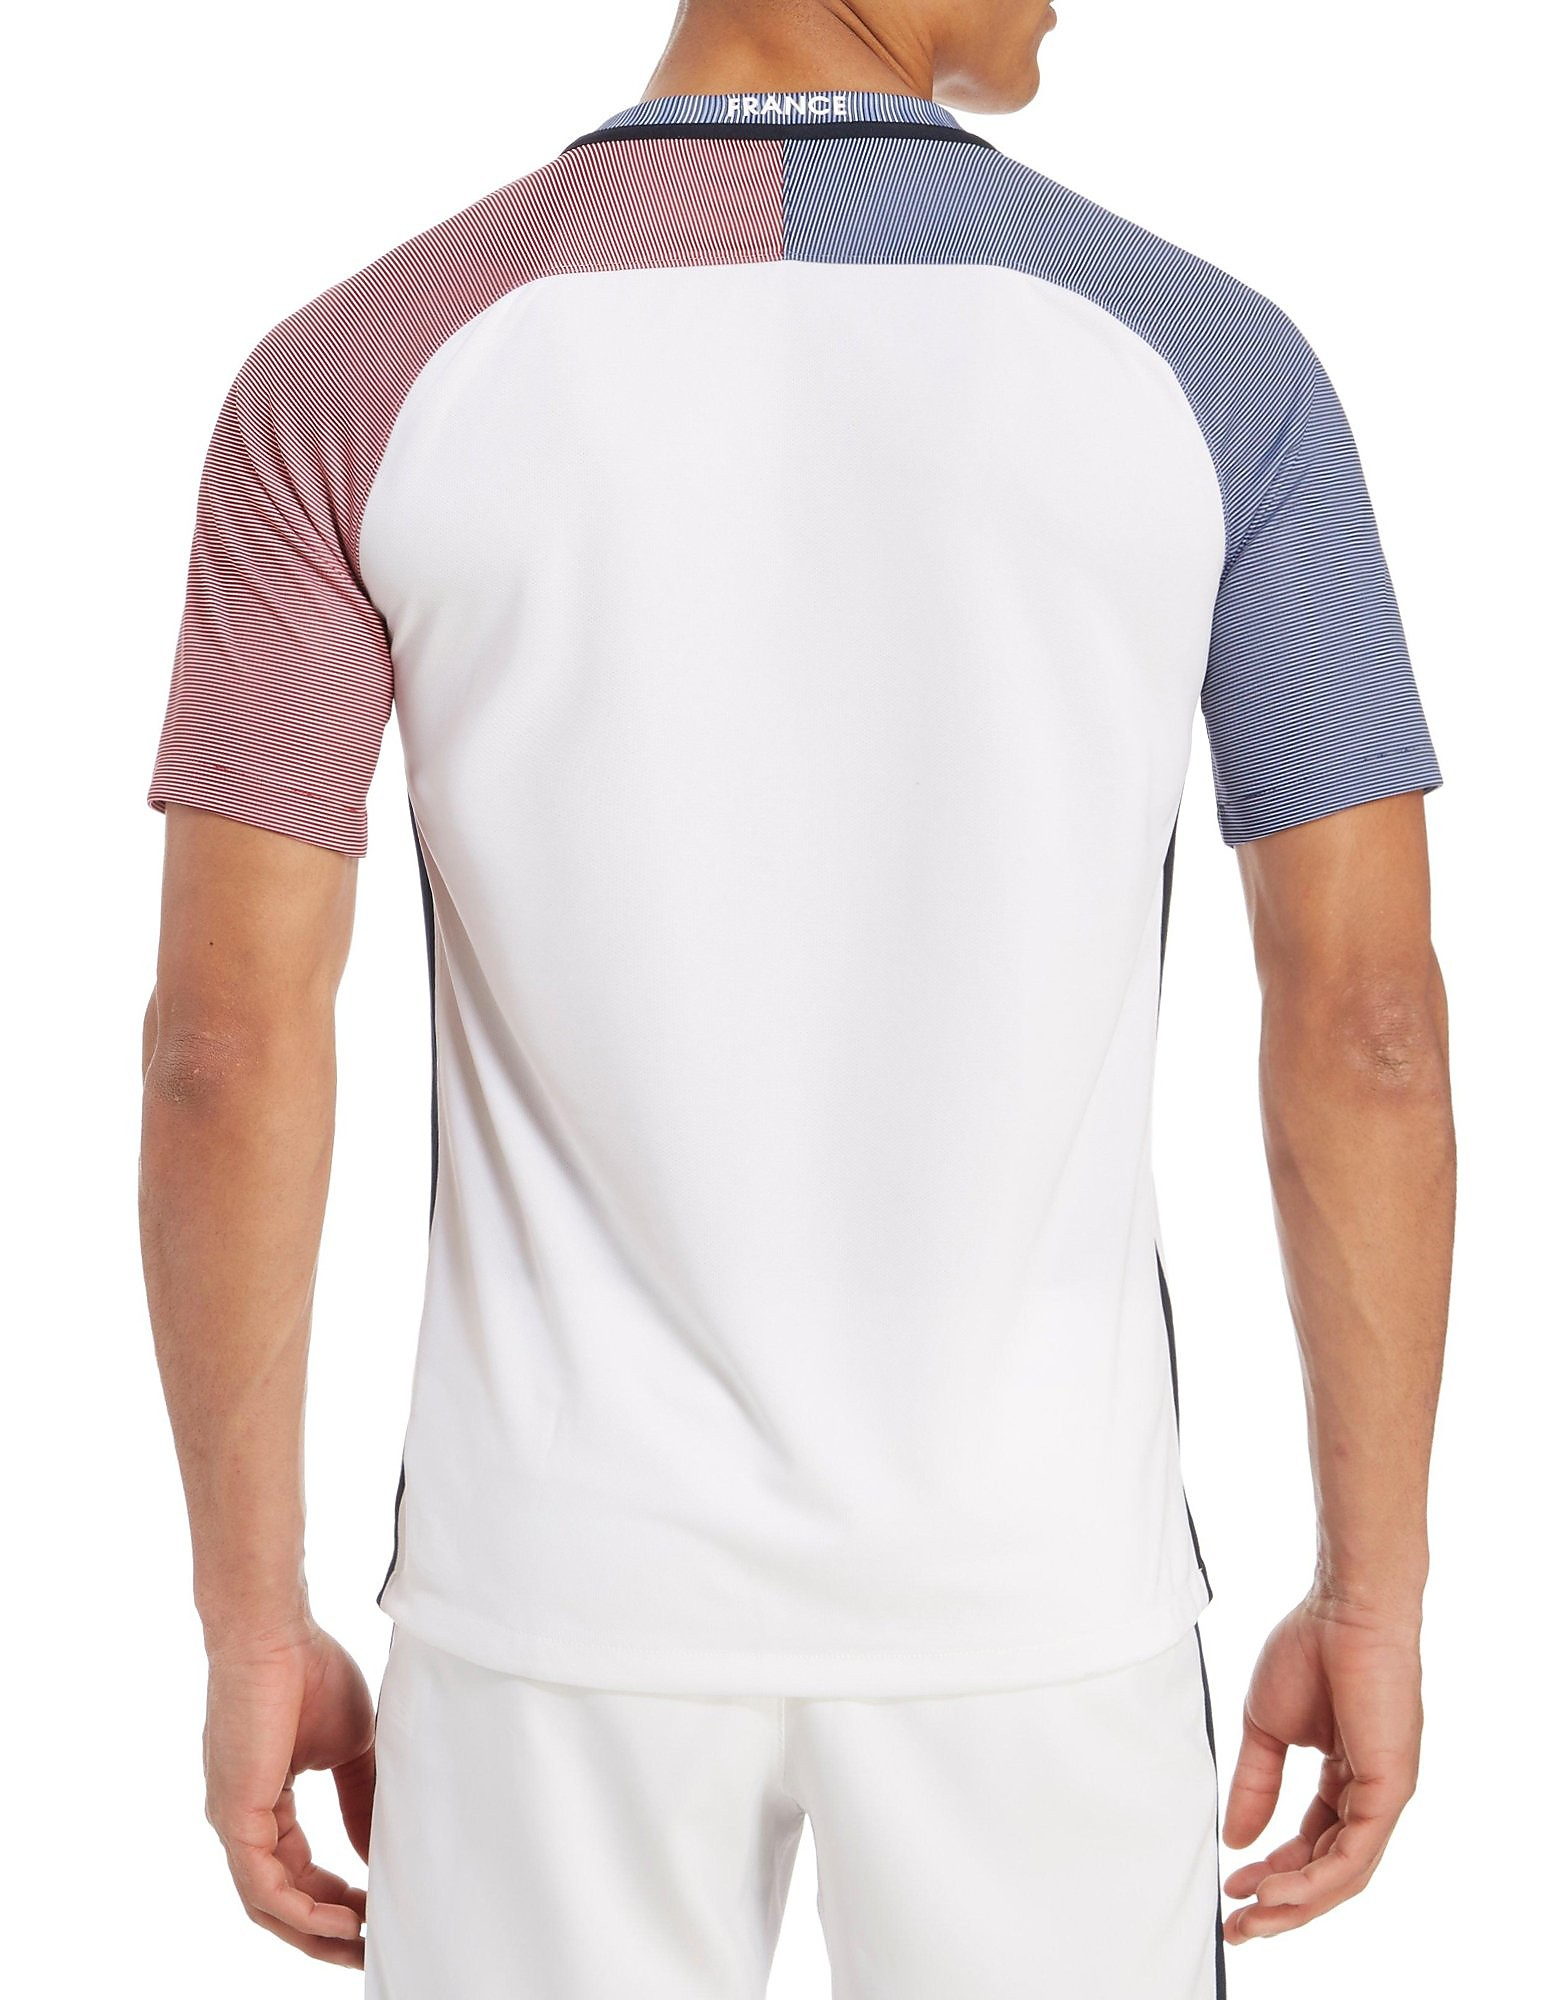 Nike France Away 2016 Shirt